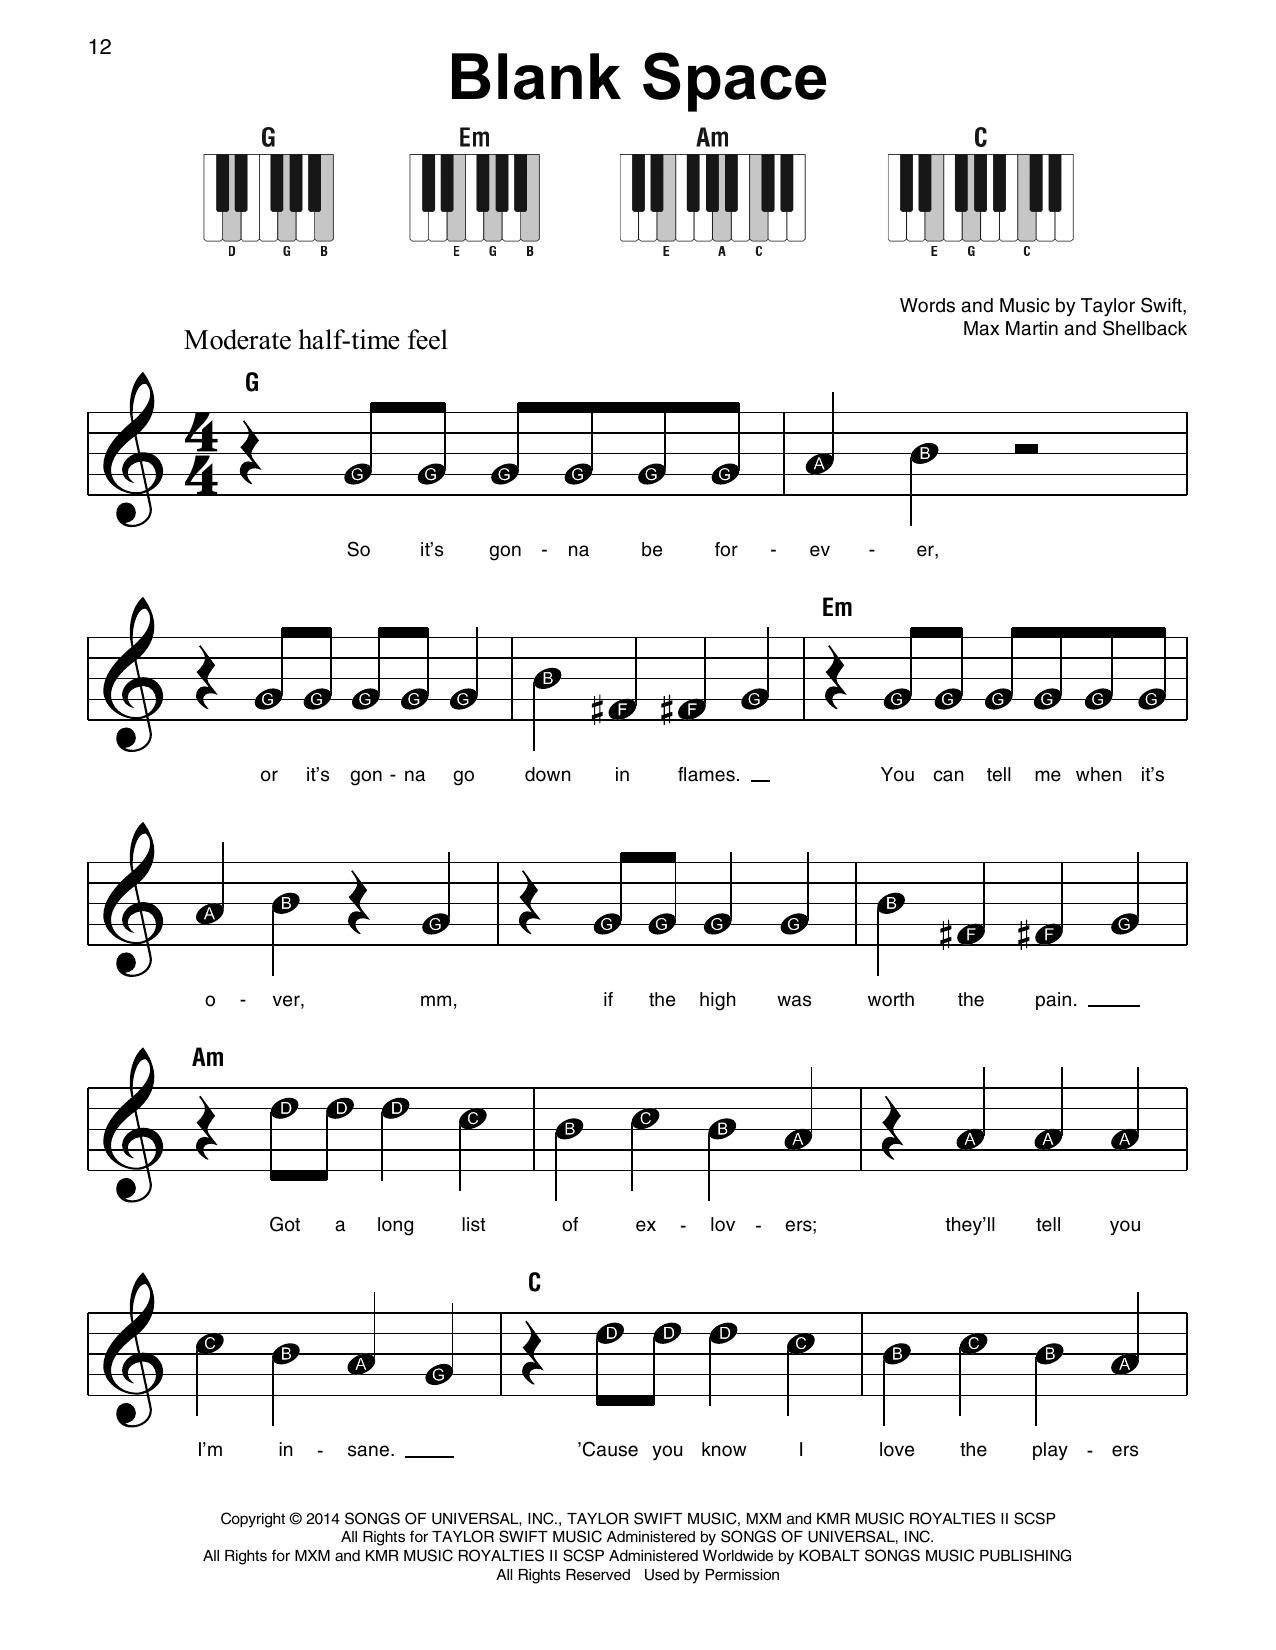 Blank Space Sheet Music